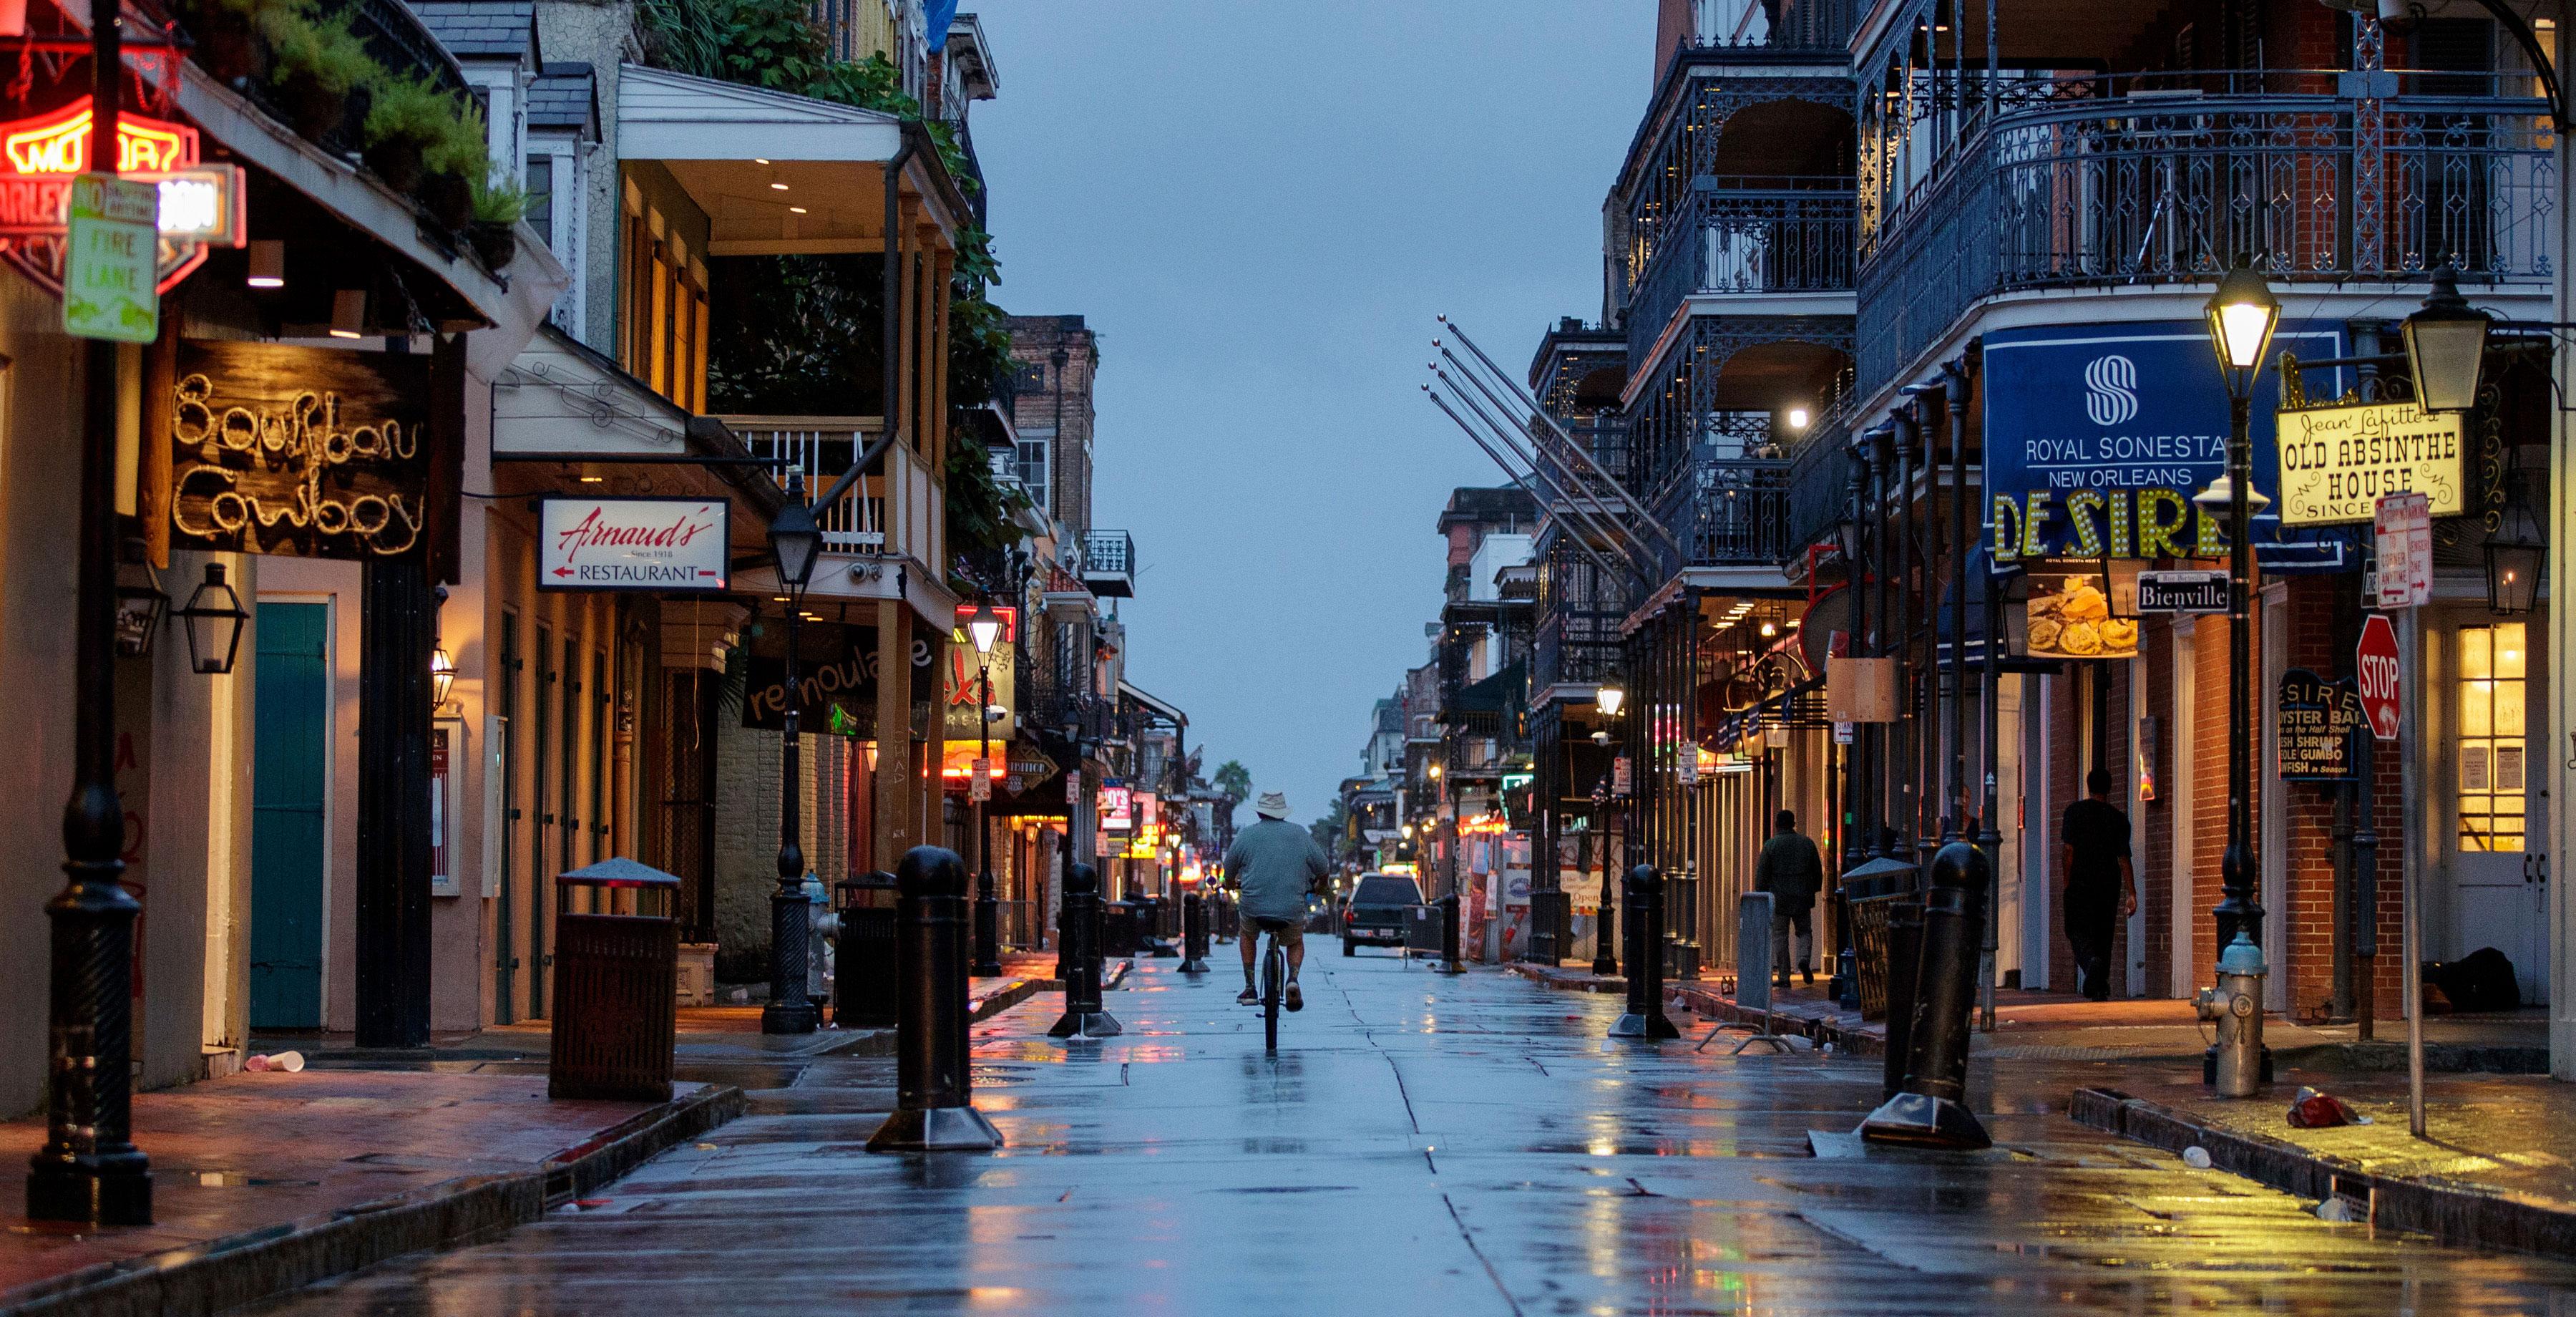 Bourbon Street is near empty ahead of Hurricane Ida in New Orleans on August 29, 2021.